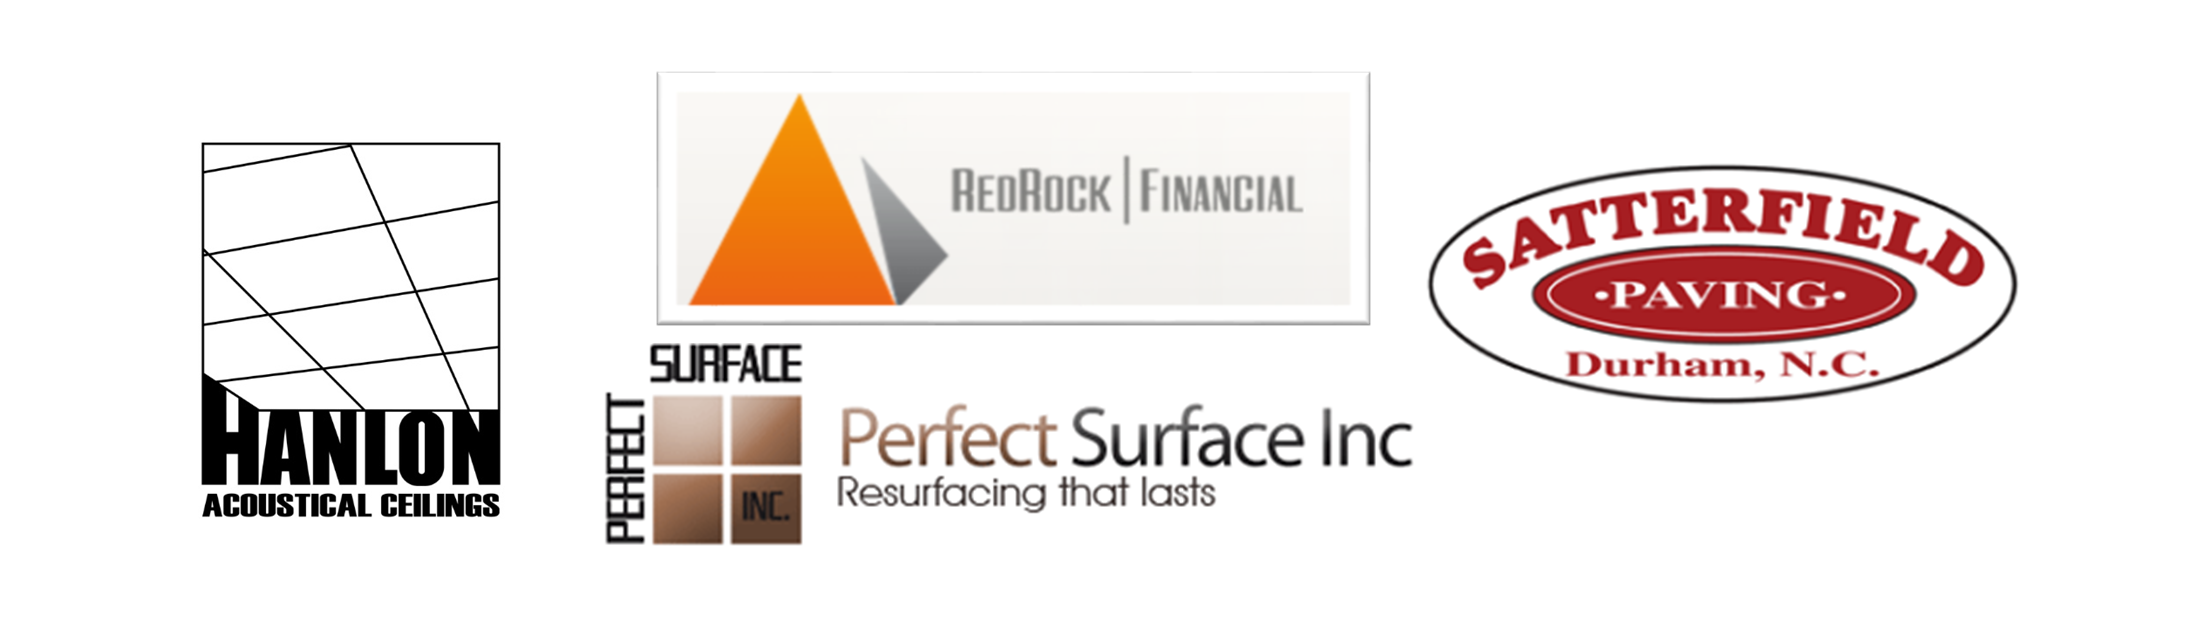 Halstatt Legacy Partners' acquisitions